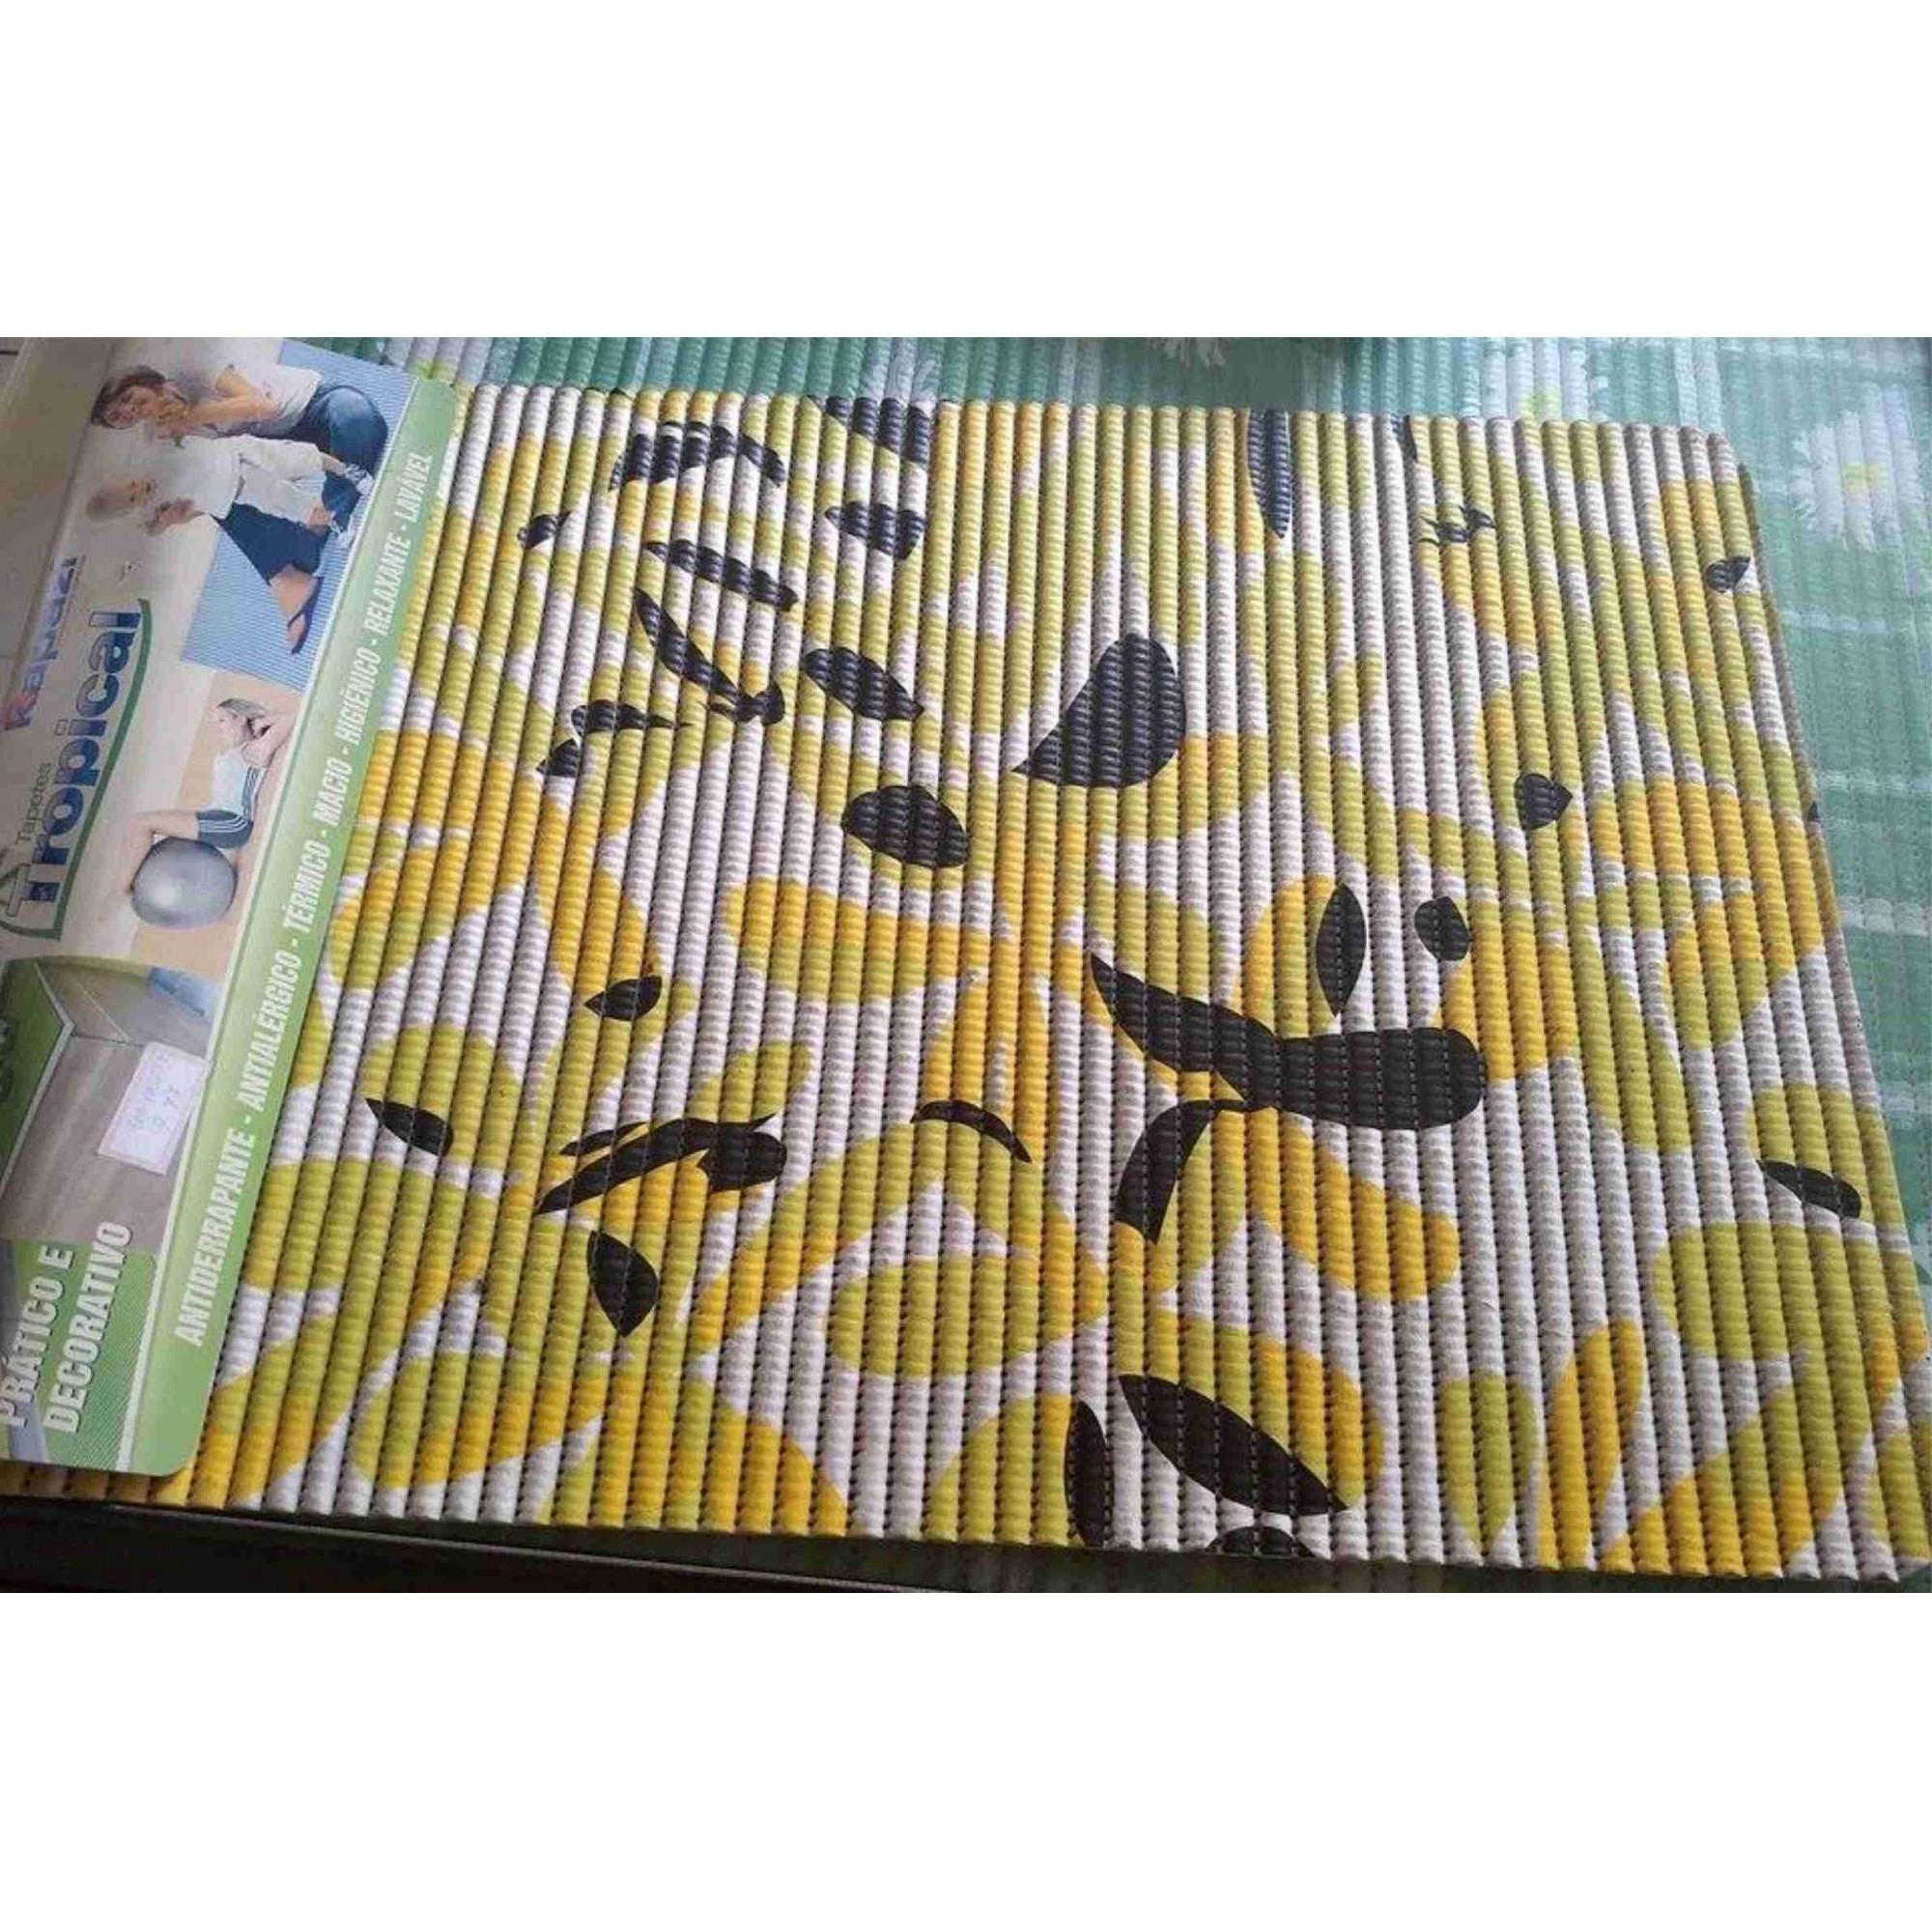 Tapete Tropical Floral 0 65×0 43 Rodapex Tapetes Personalizados -> Tapete De Sala Pintado